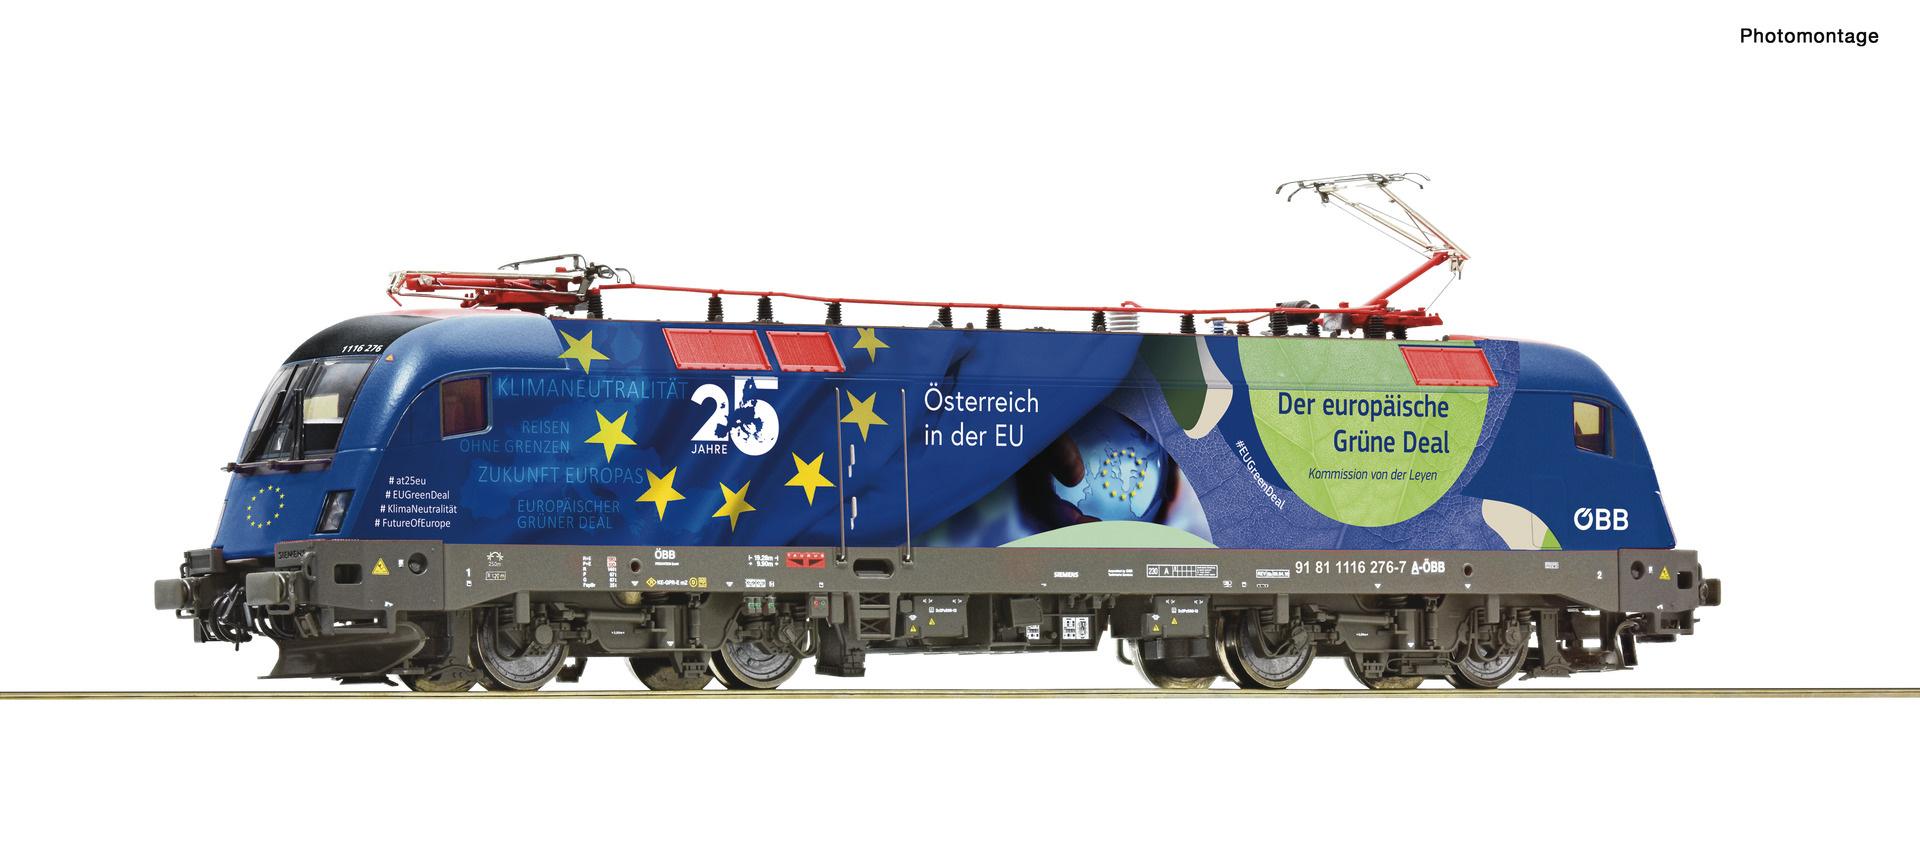 70501 E-Lok 1116 276 EU-1